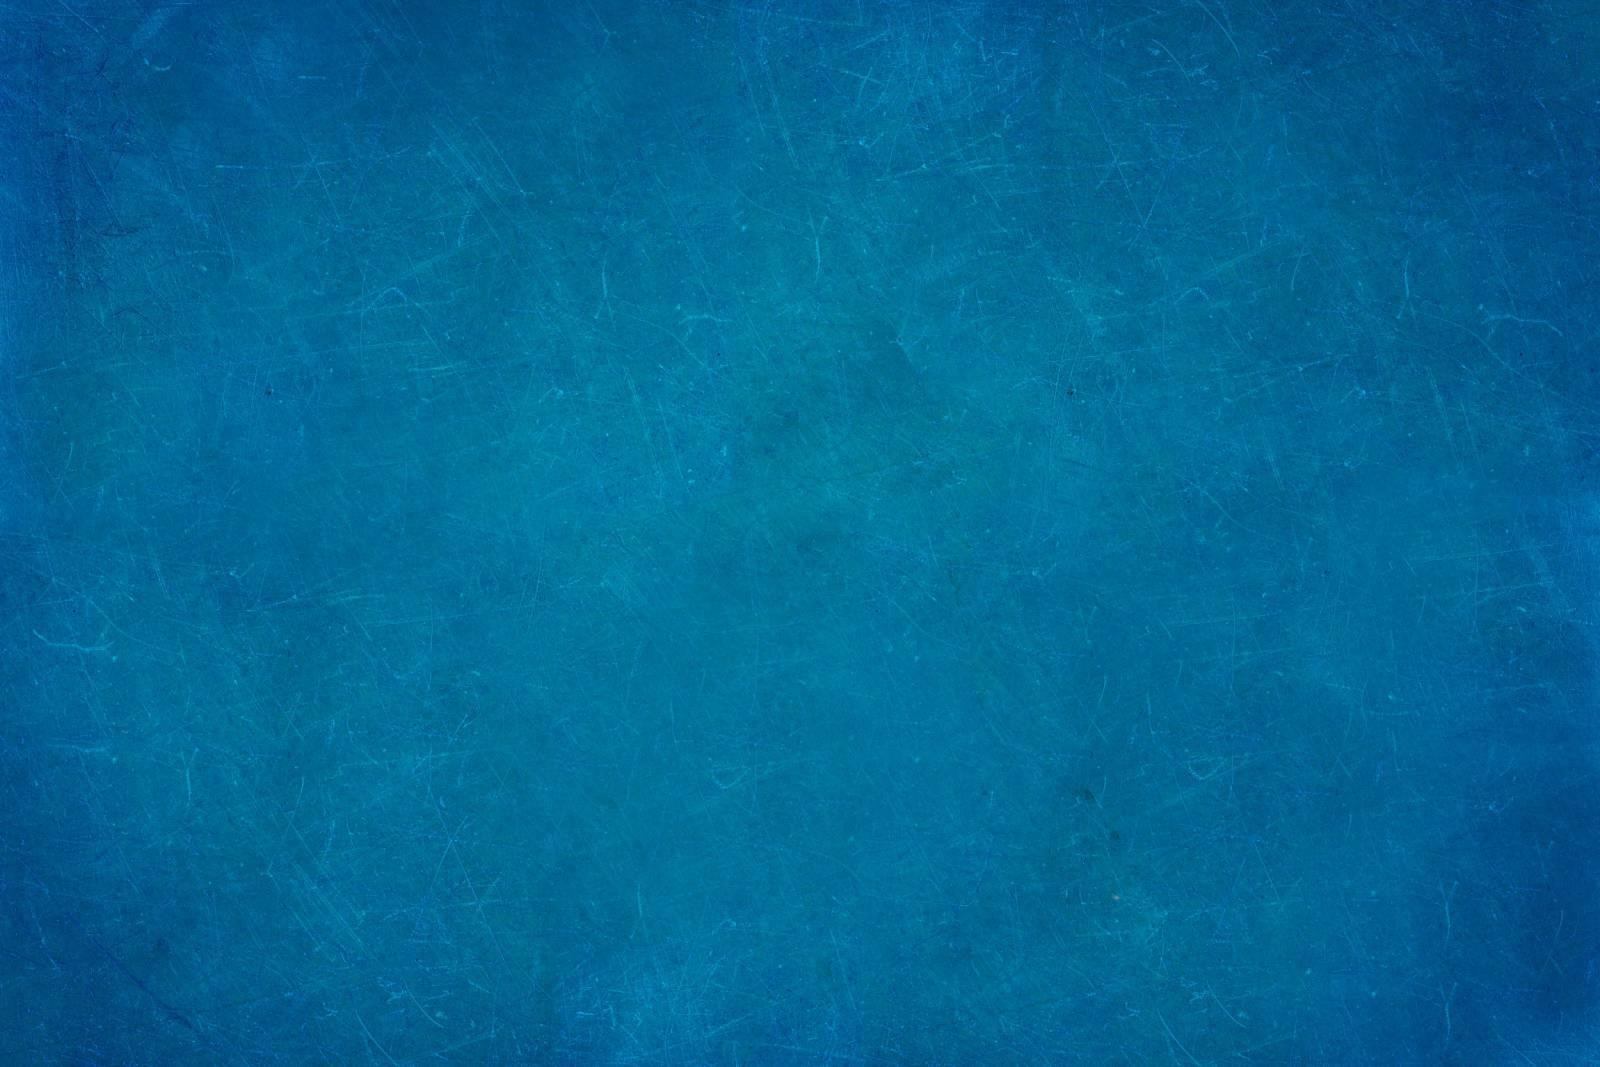 blue background e1533025902138